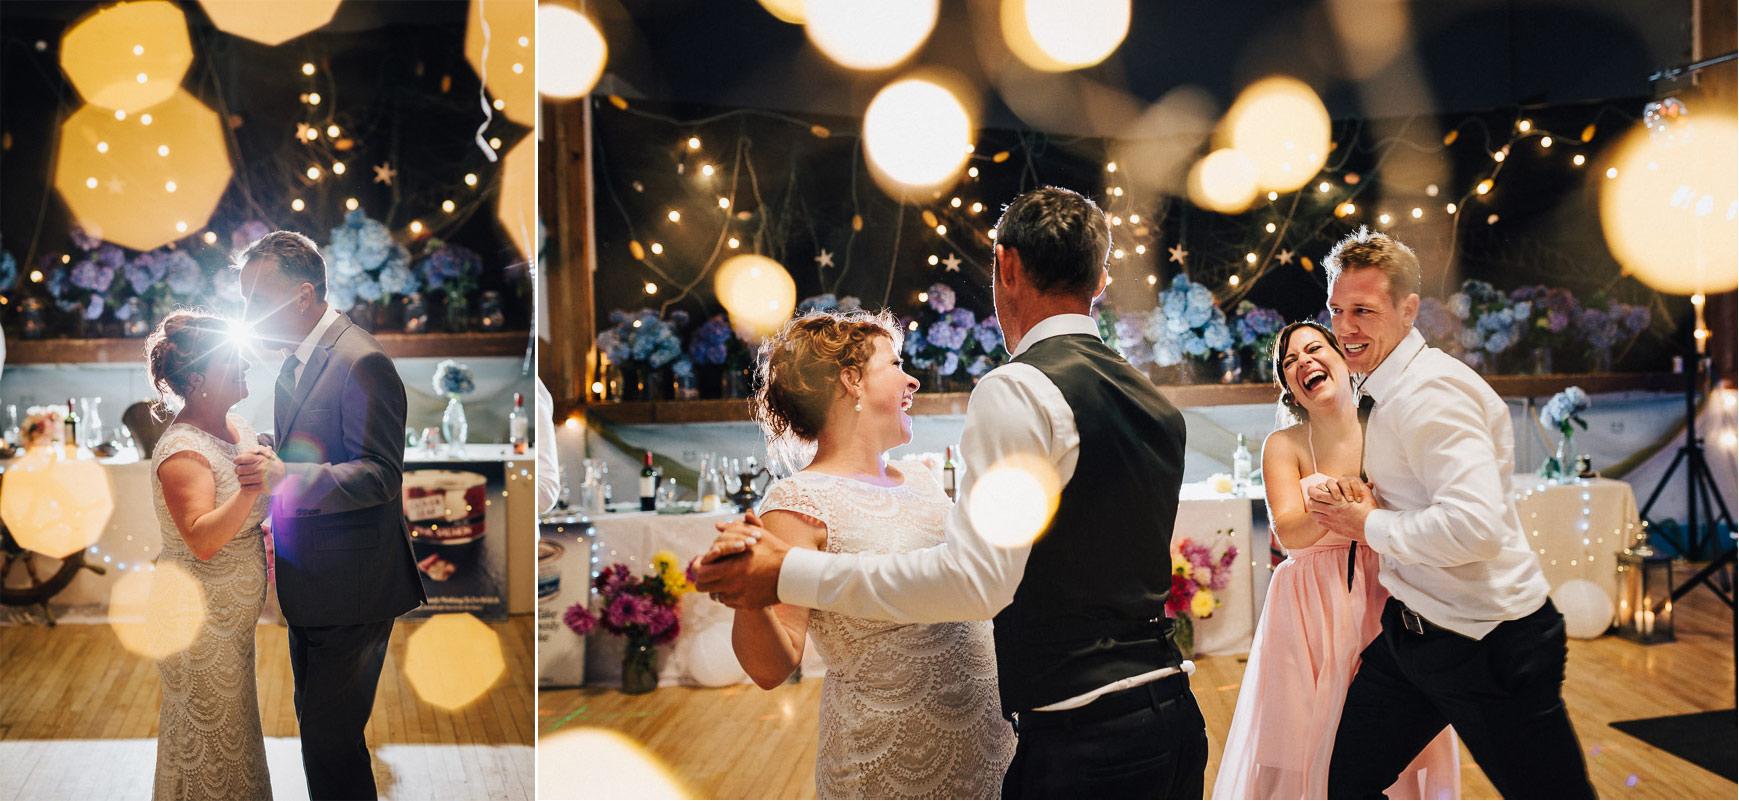 perth-destination-wedding-photographer-116.jpg